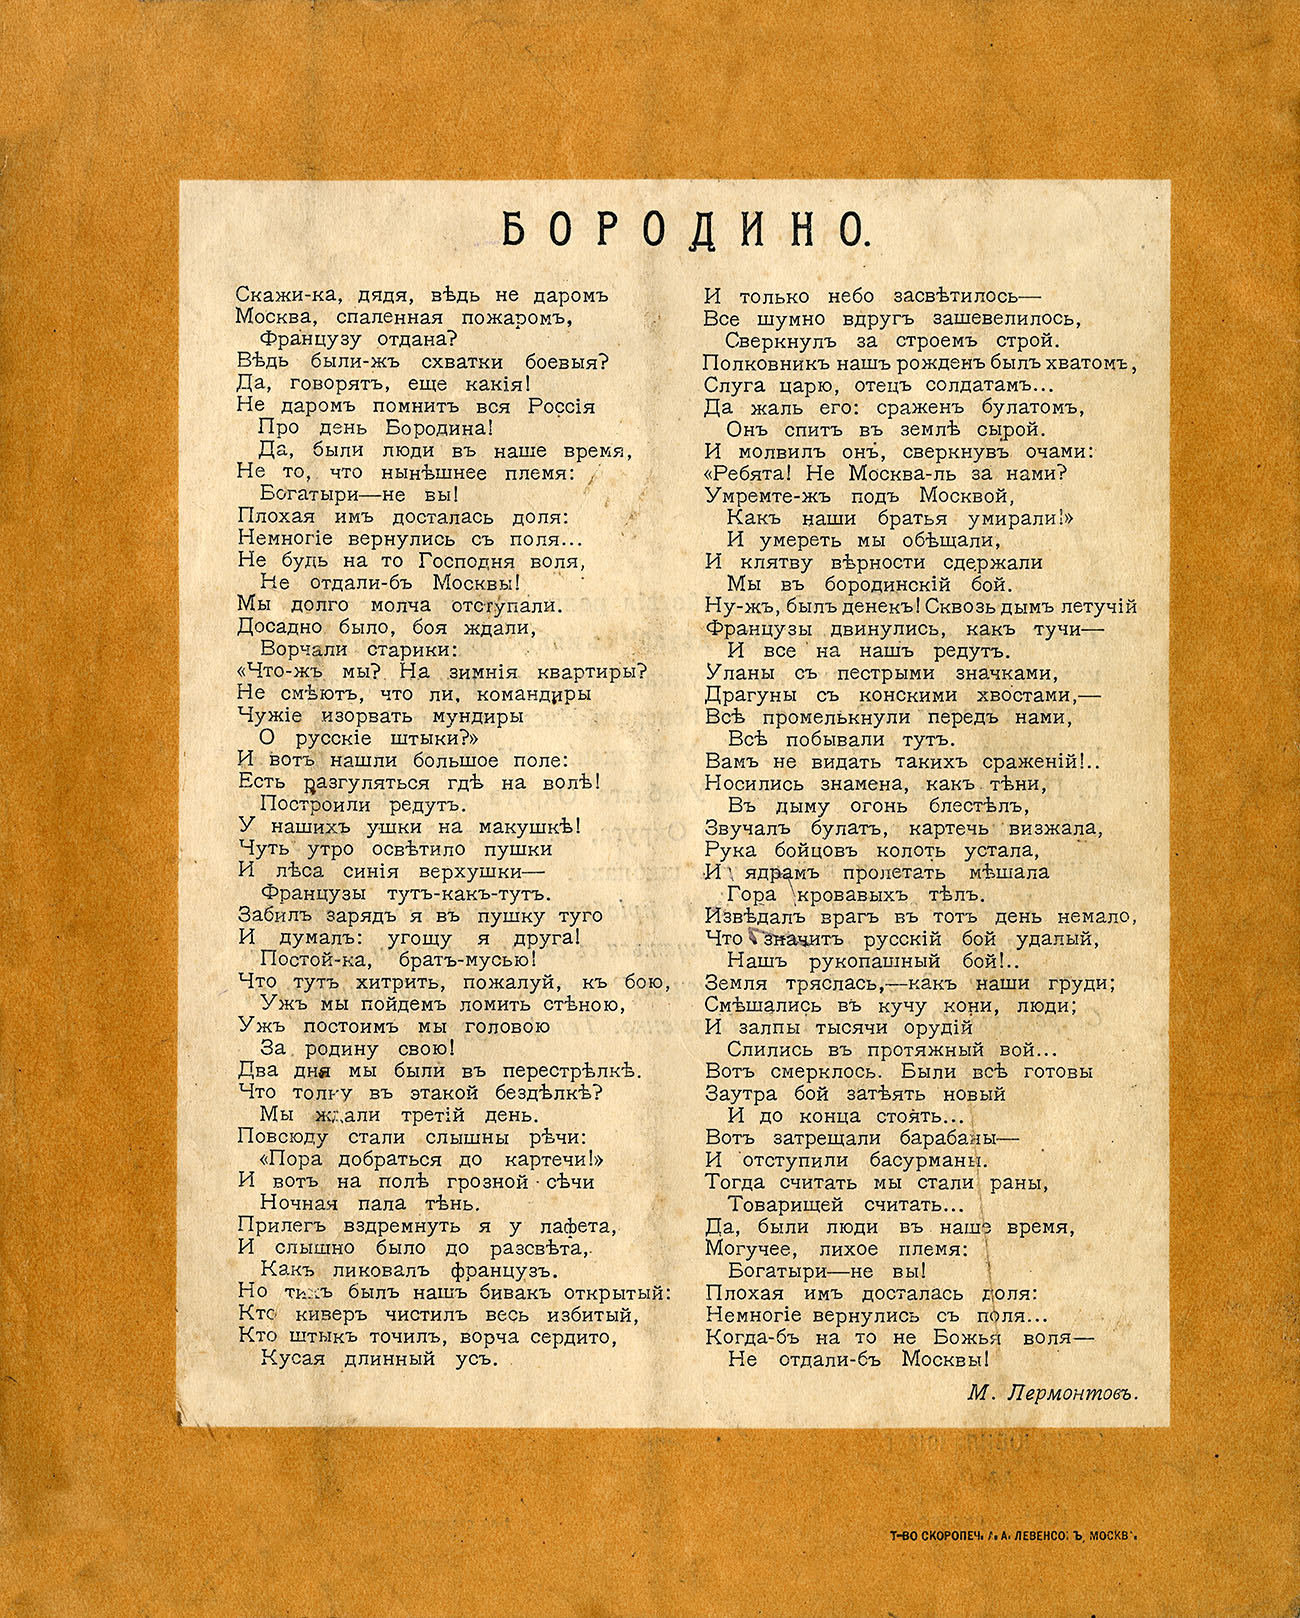 100 лет Бородино (оранж.), оборот